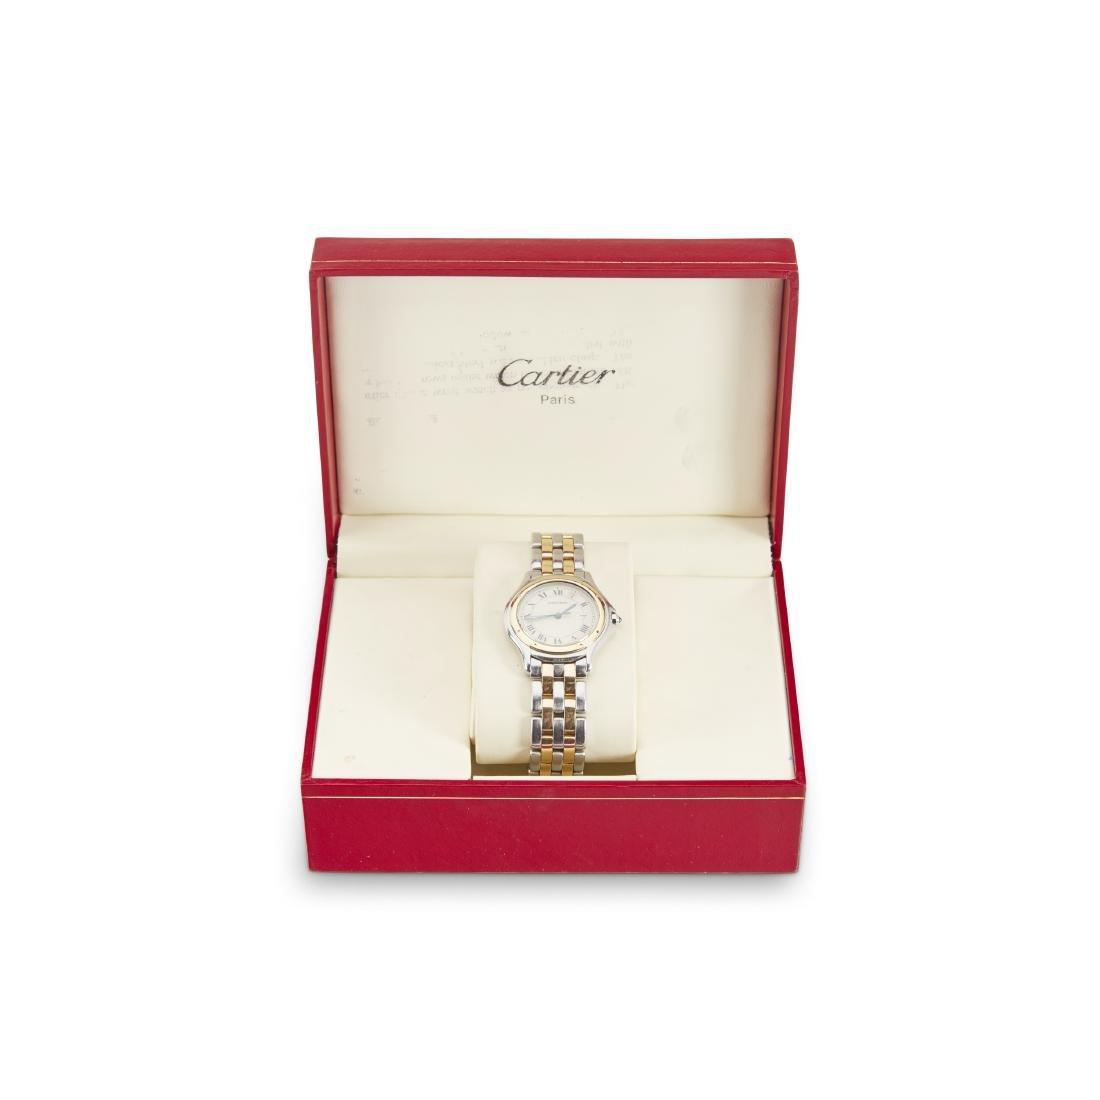 Cartier, Cougar Mid-Size Wristwatch